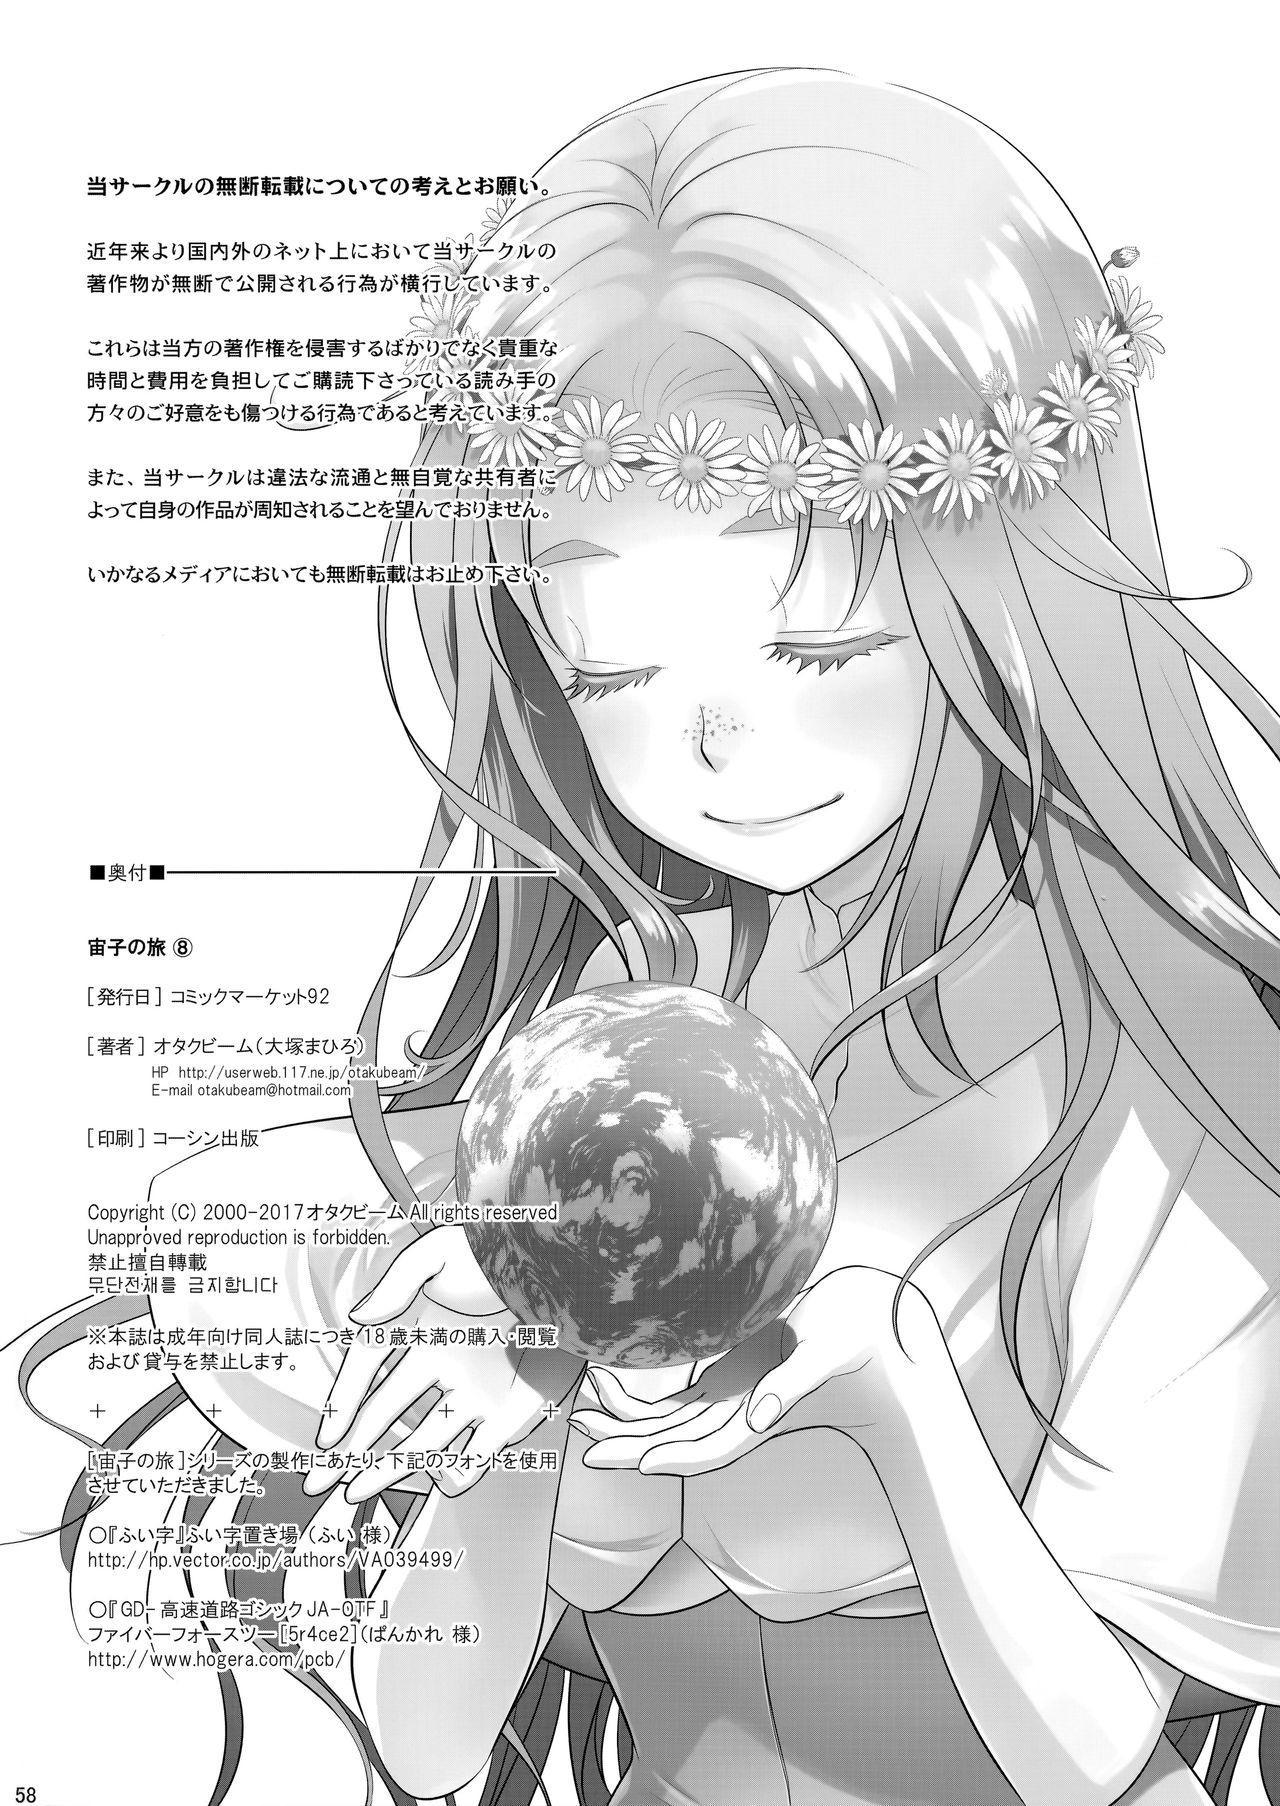 Sorako no Tabi 8 60